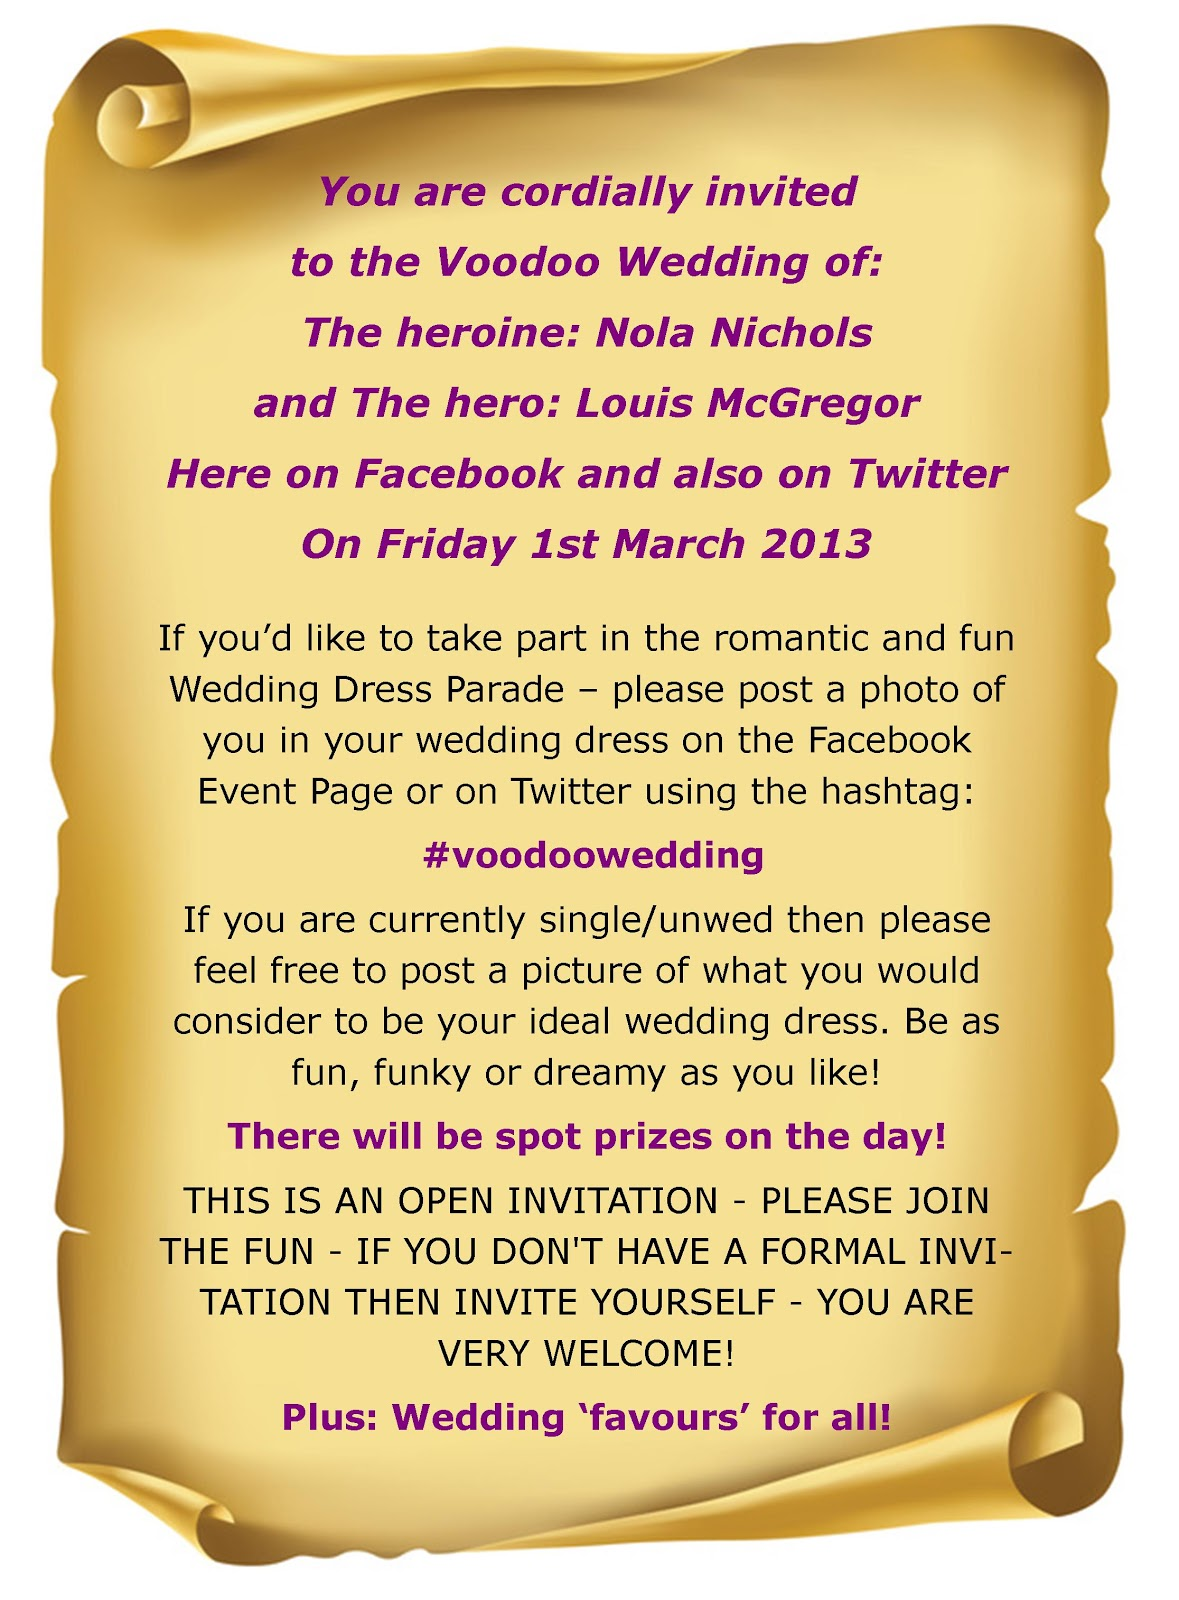 cordially invite you template you are cordially invited template cordially invited template you are cordially invited